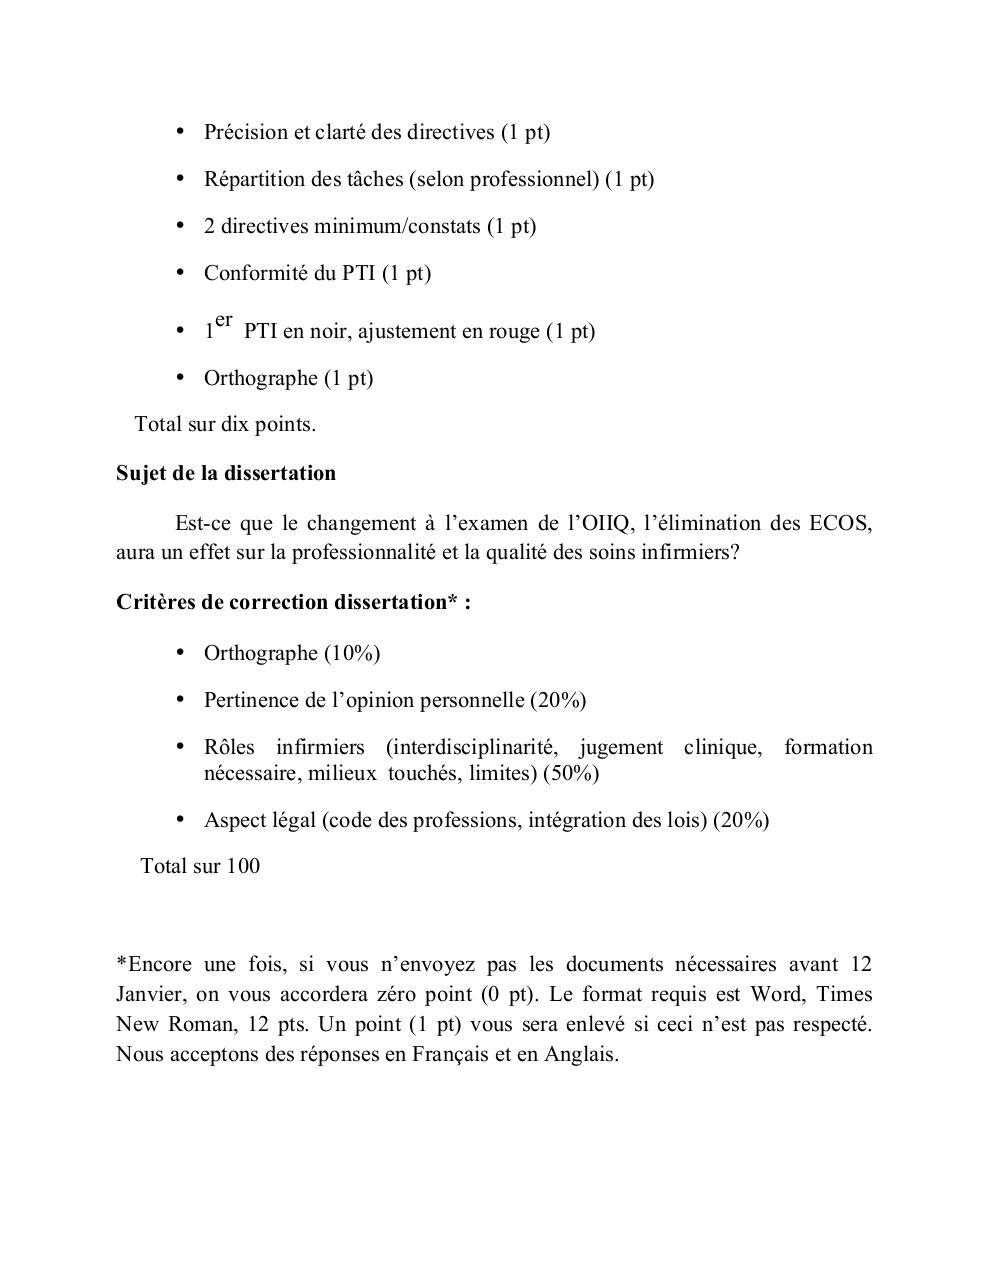 Online dissertations